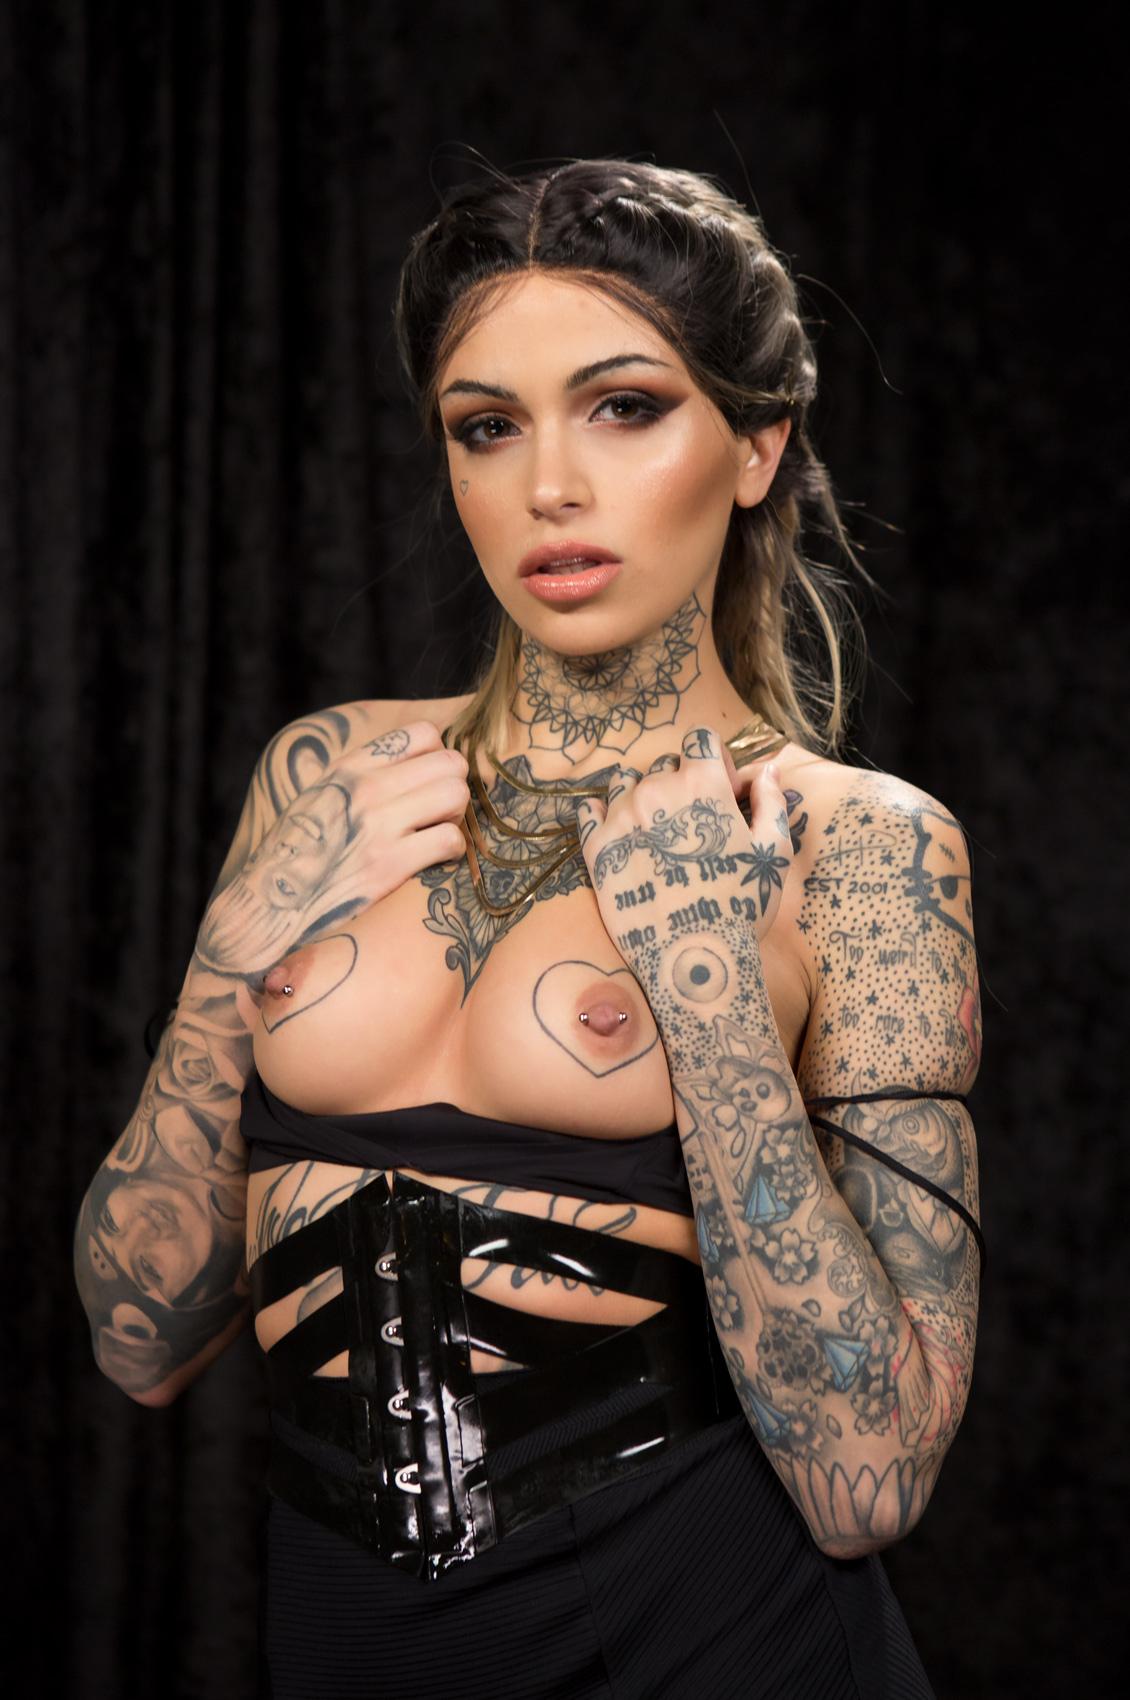 Leigh Raven's VR Porn Videos, Bio & Free Nude Pics